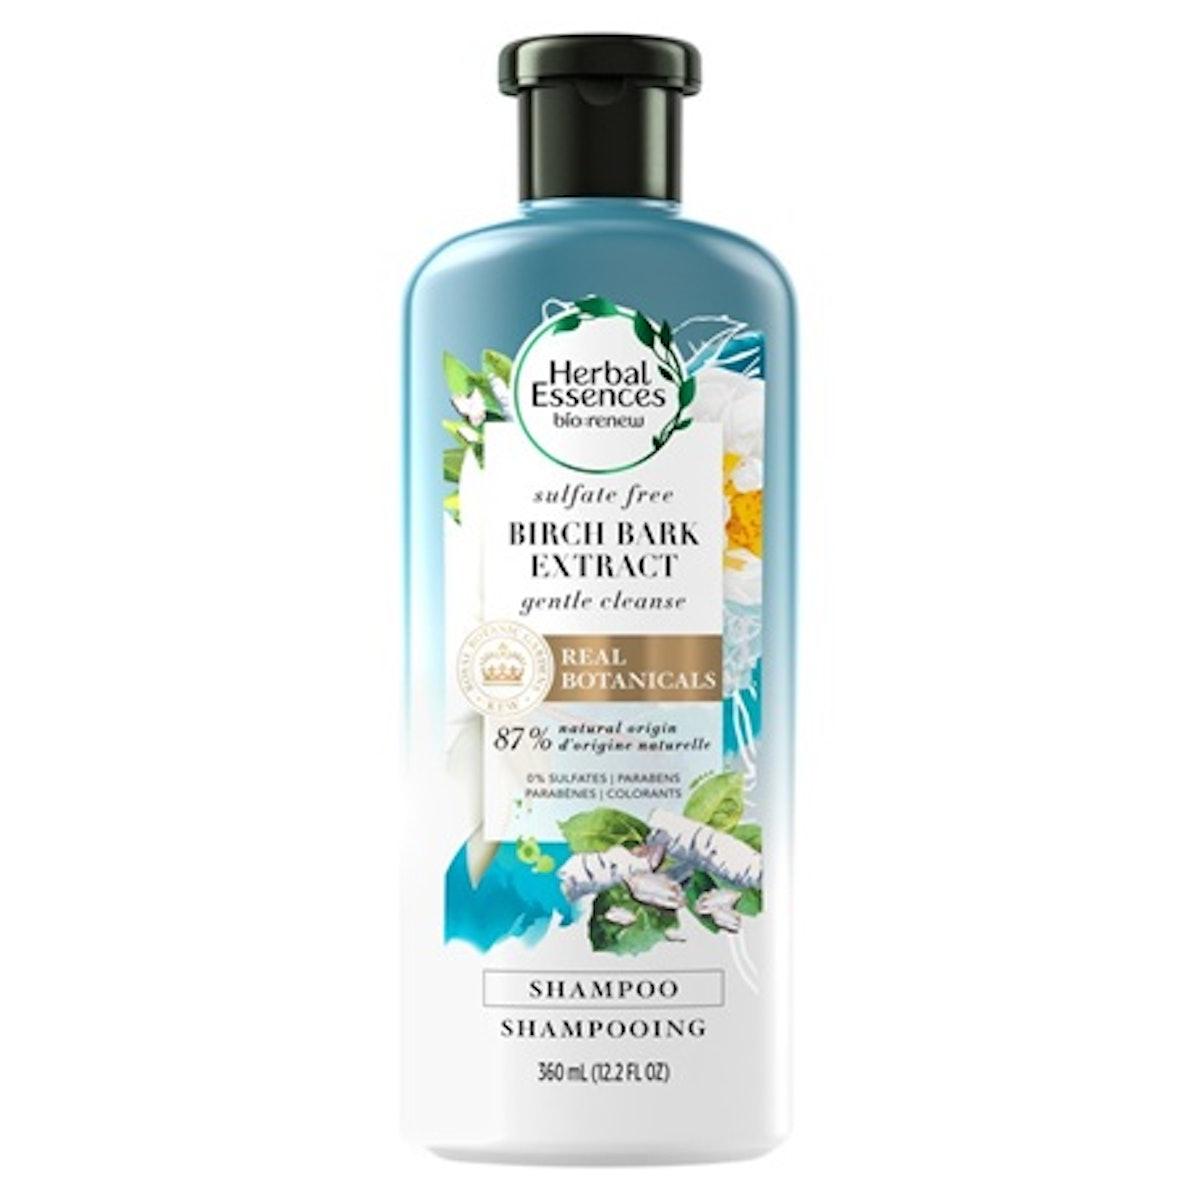 Birch Bark Extract Sulfate-Free Shampoo